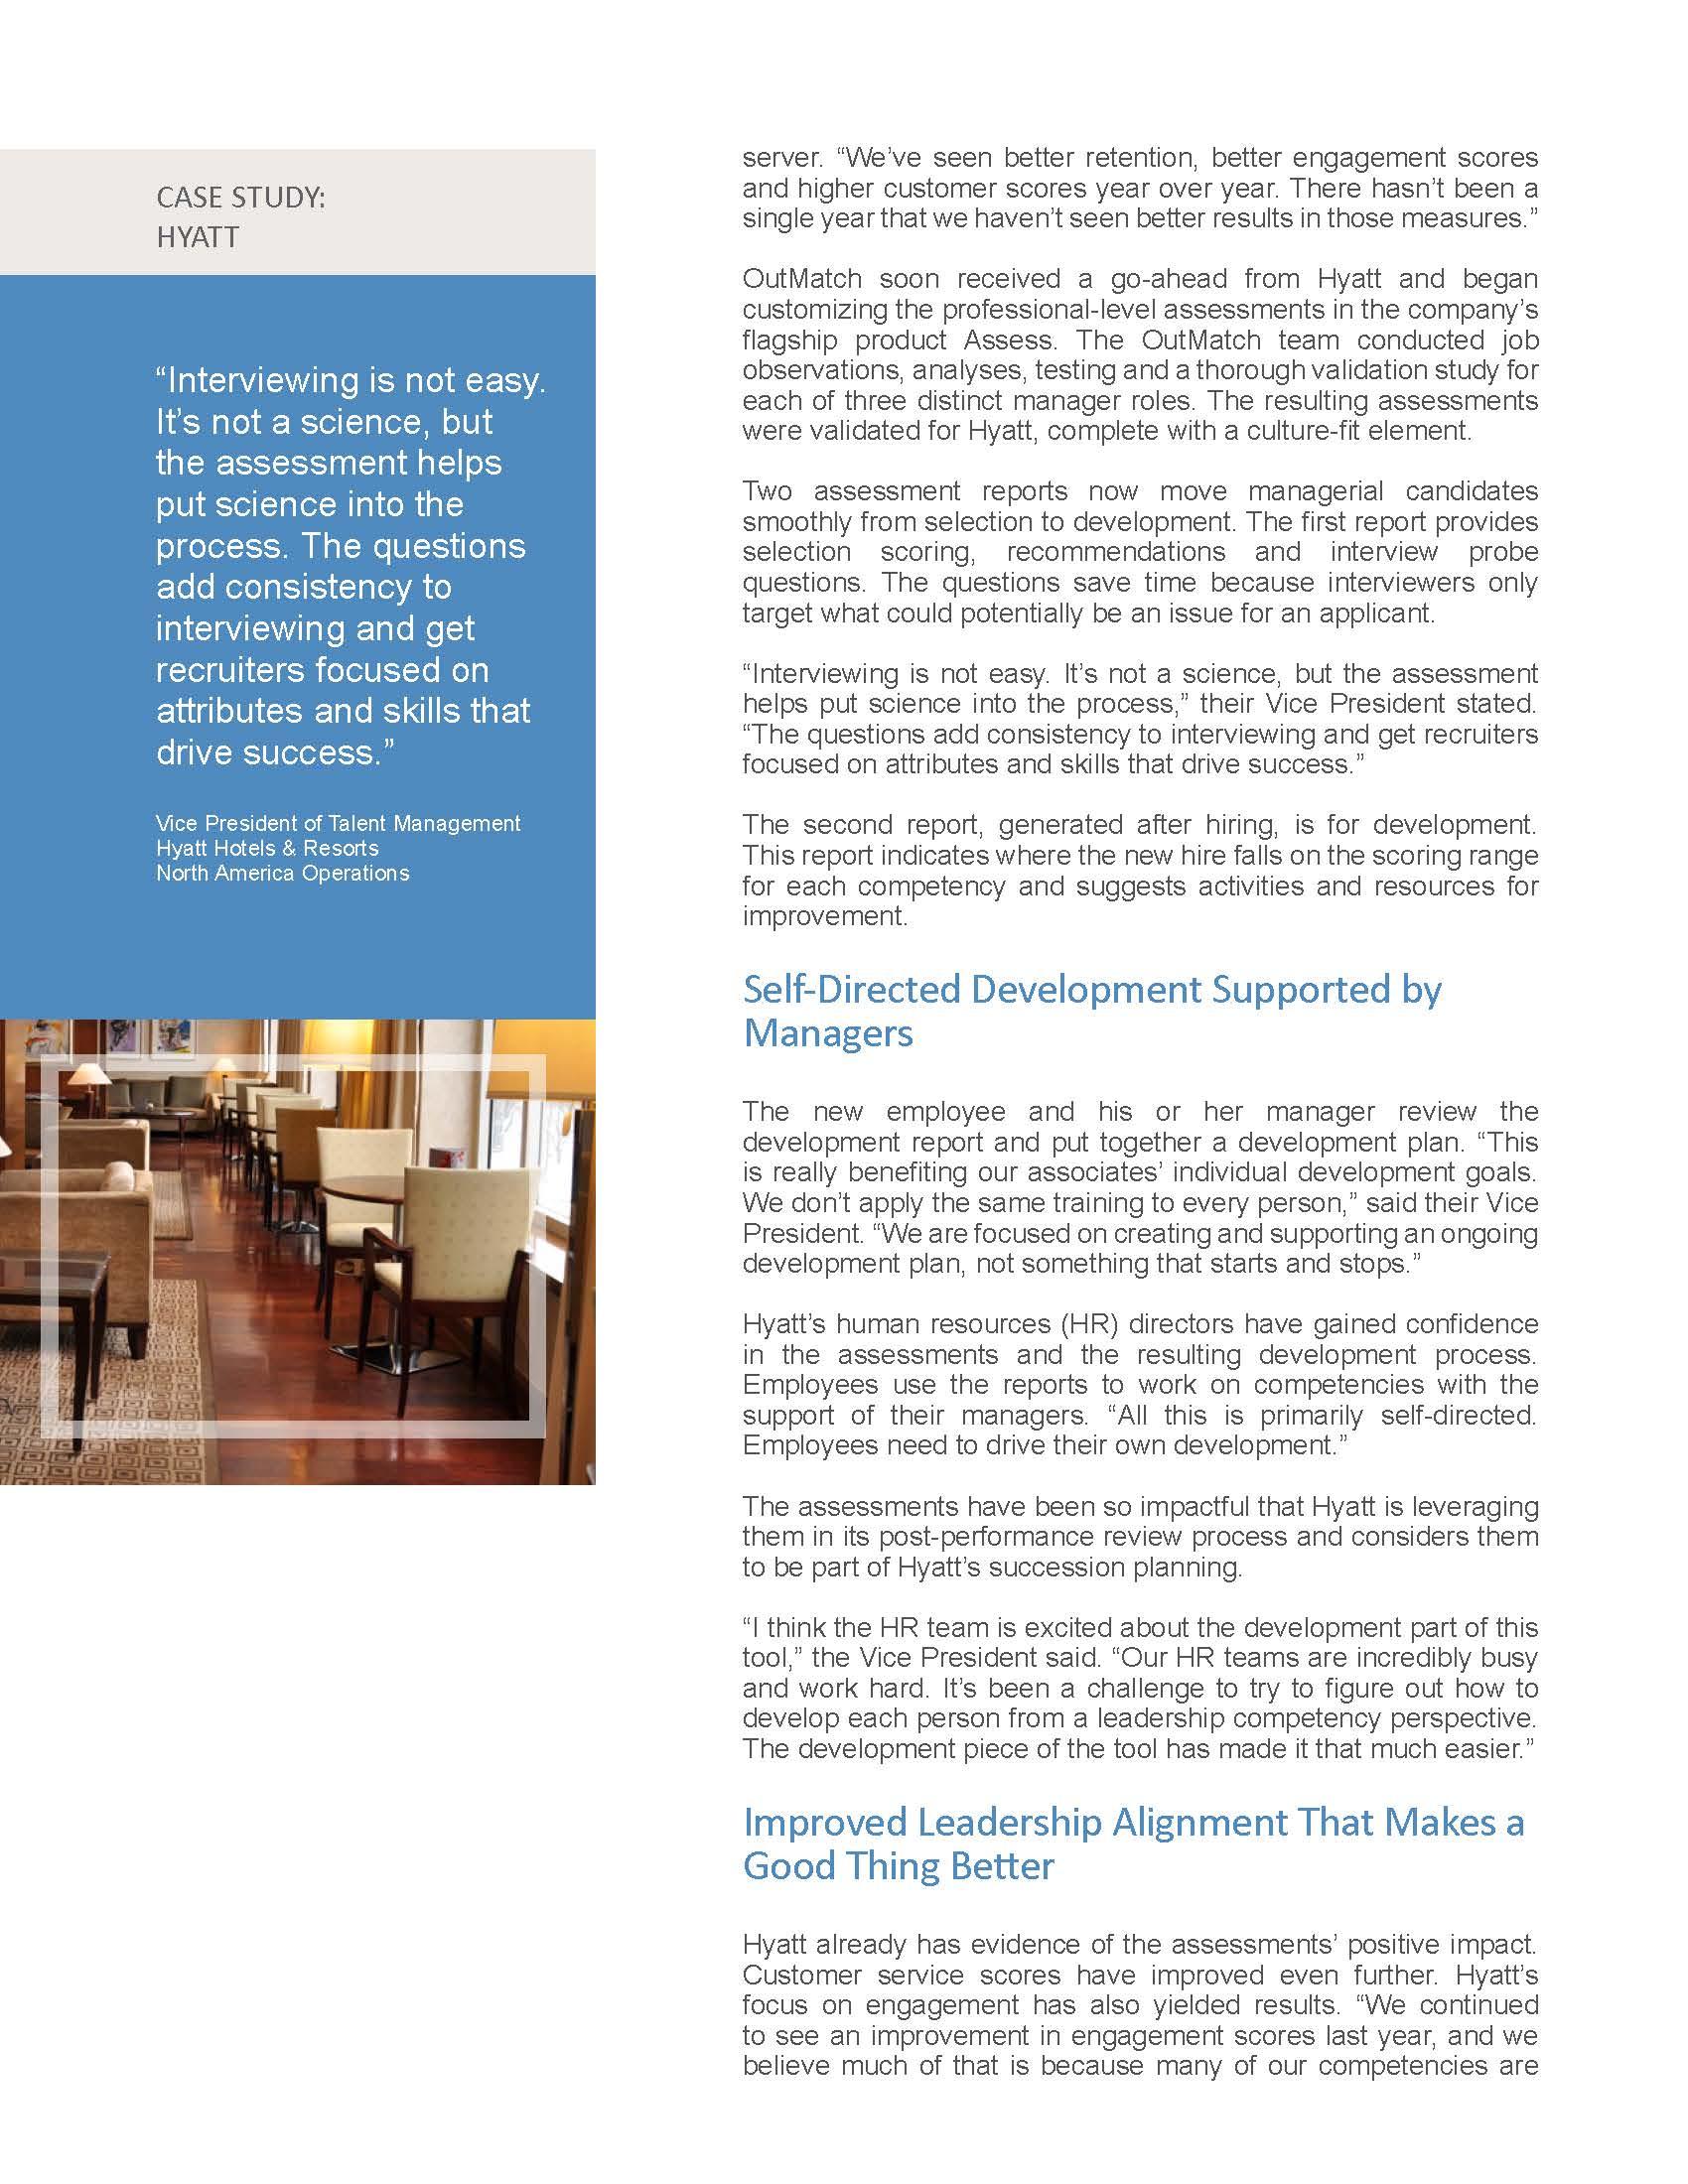 case-study-hyatt-development_Page_2